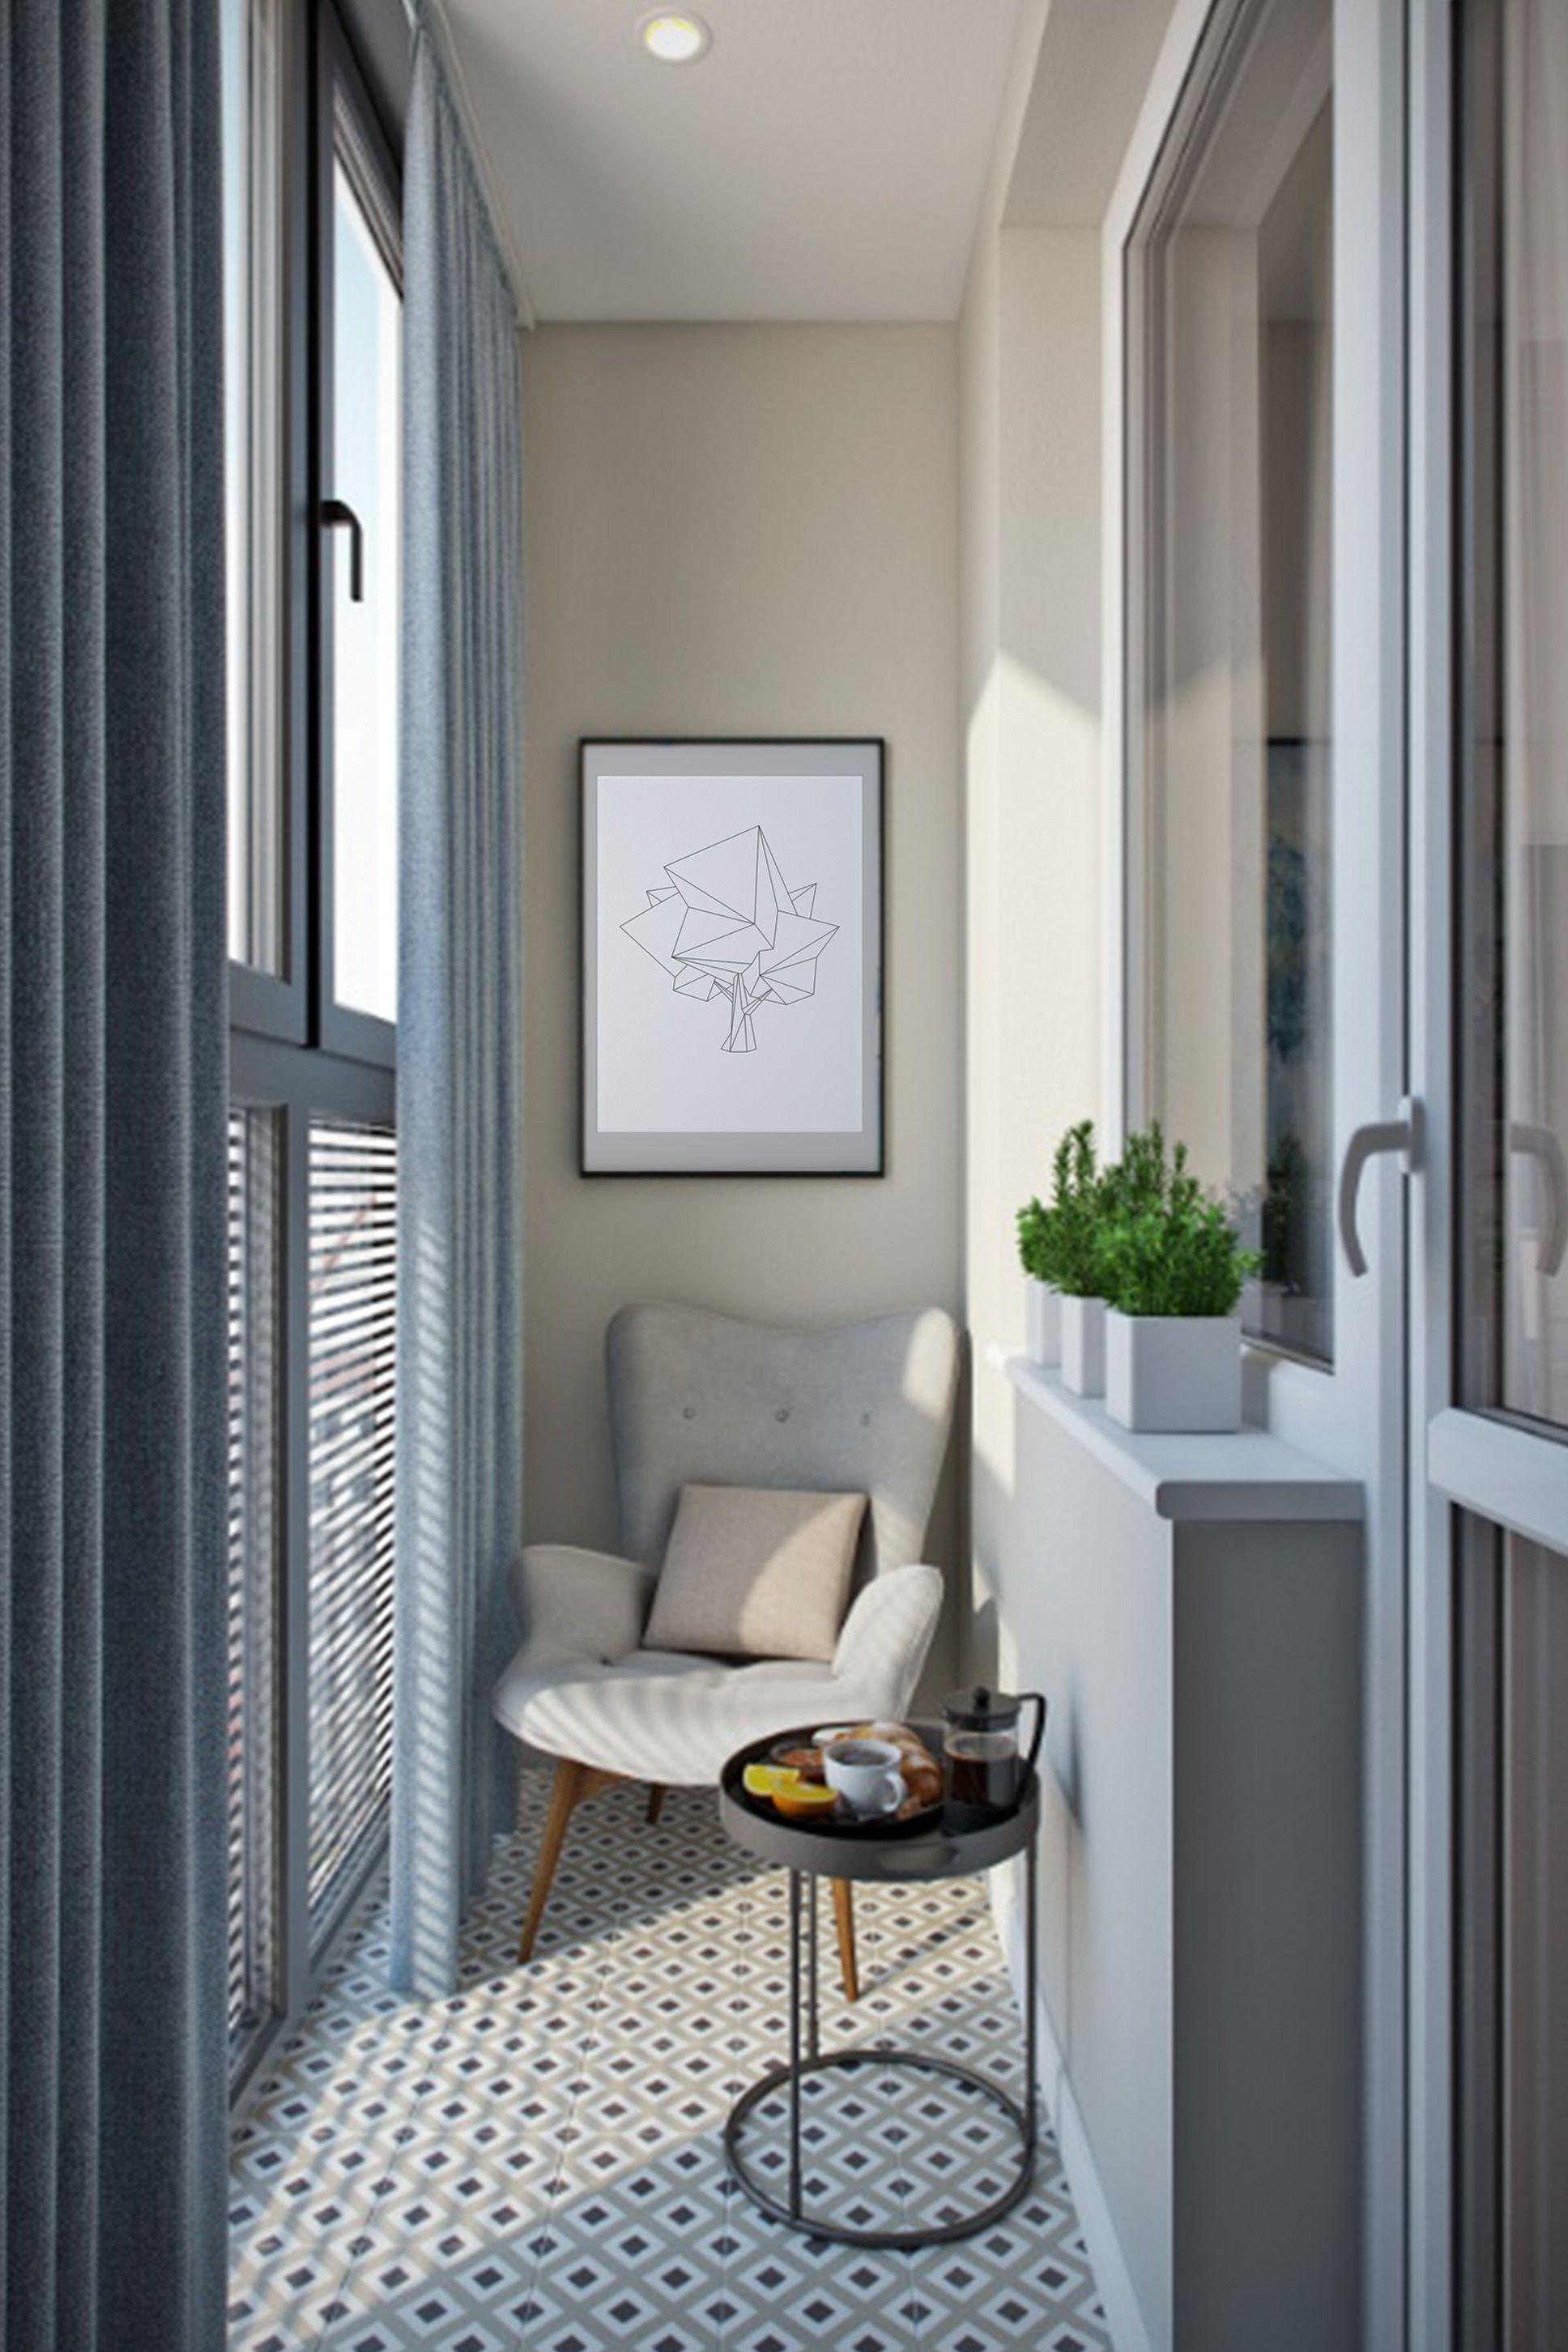 Polygonal Tree Geometric Print, Home And Office Decor, Modern Art,